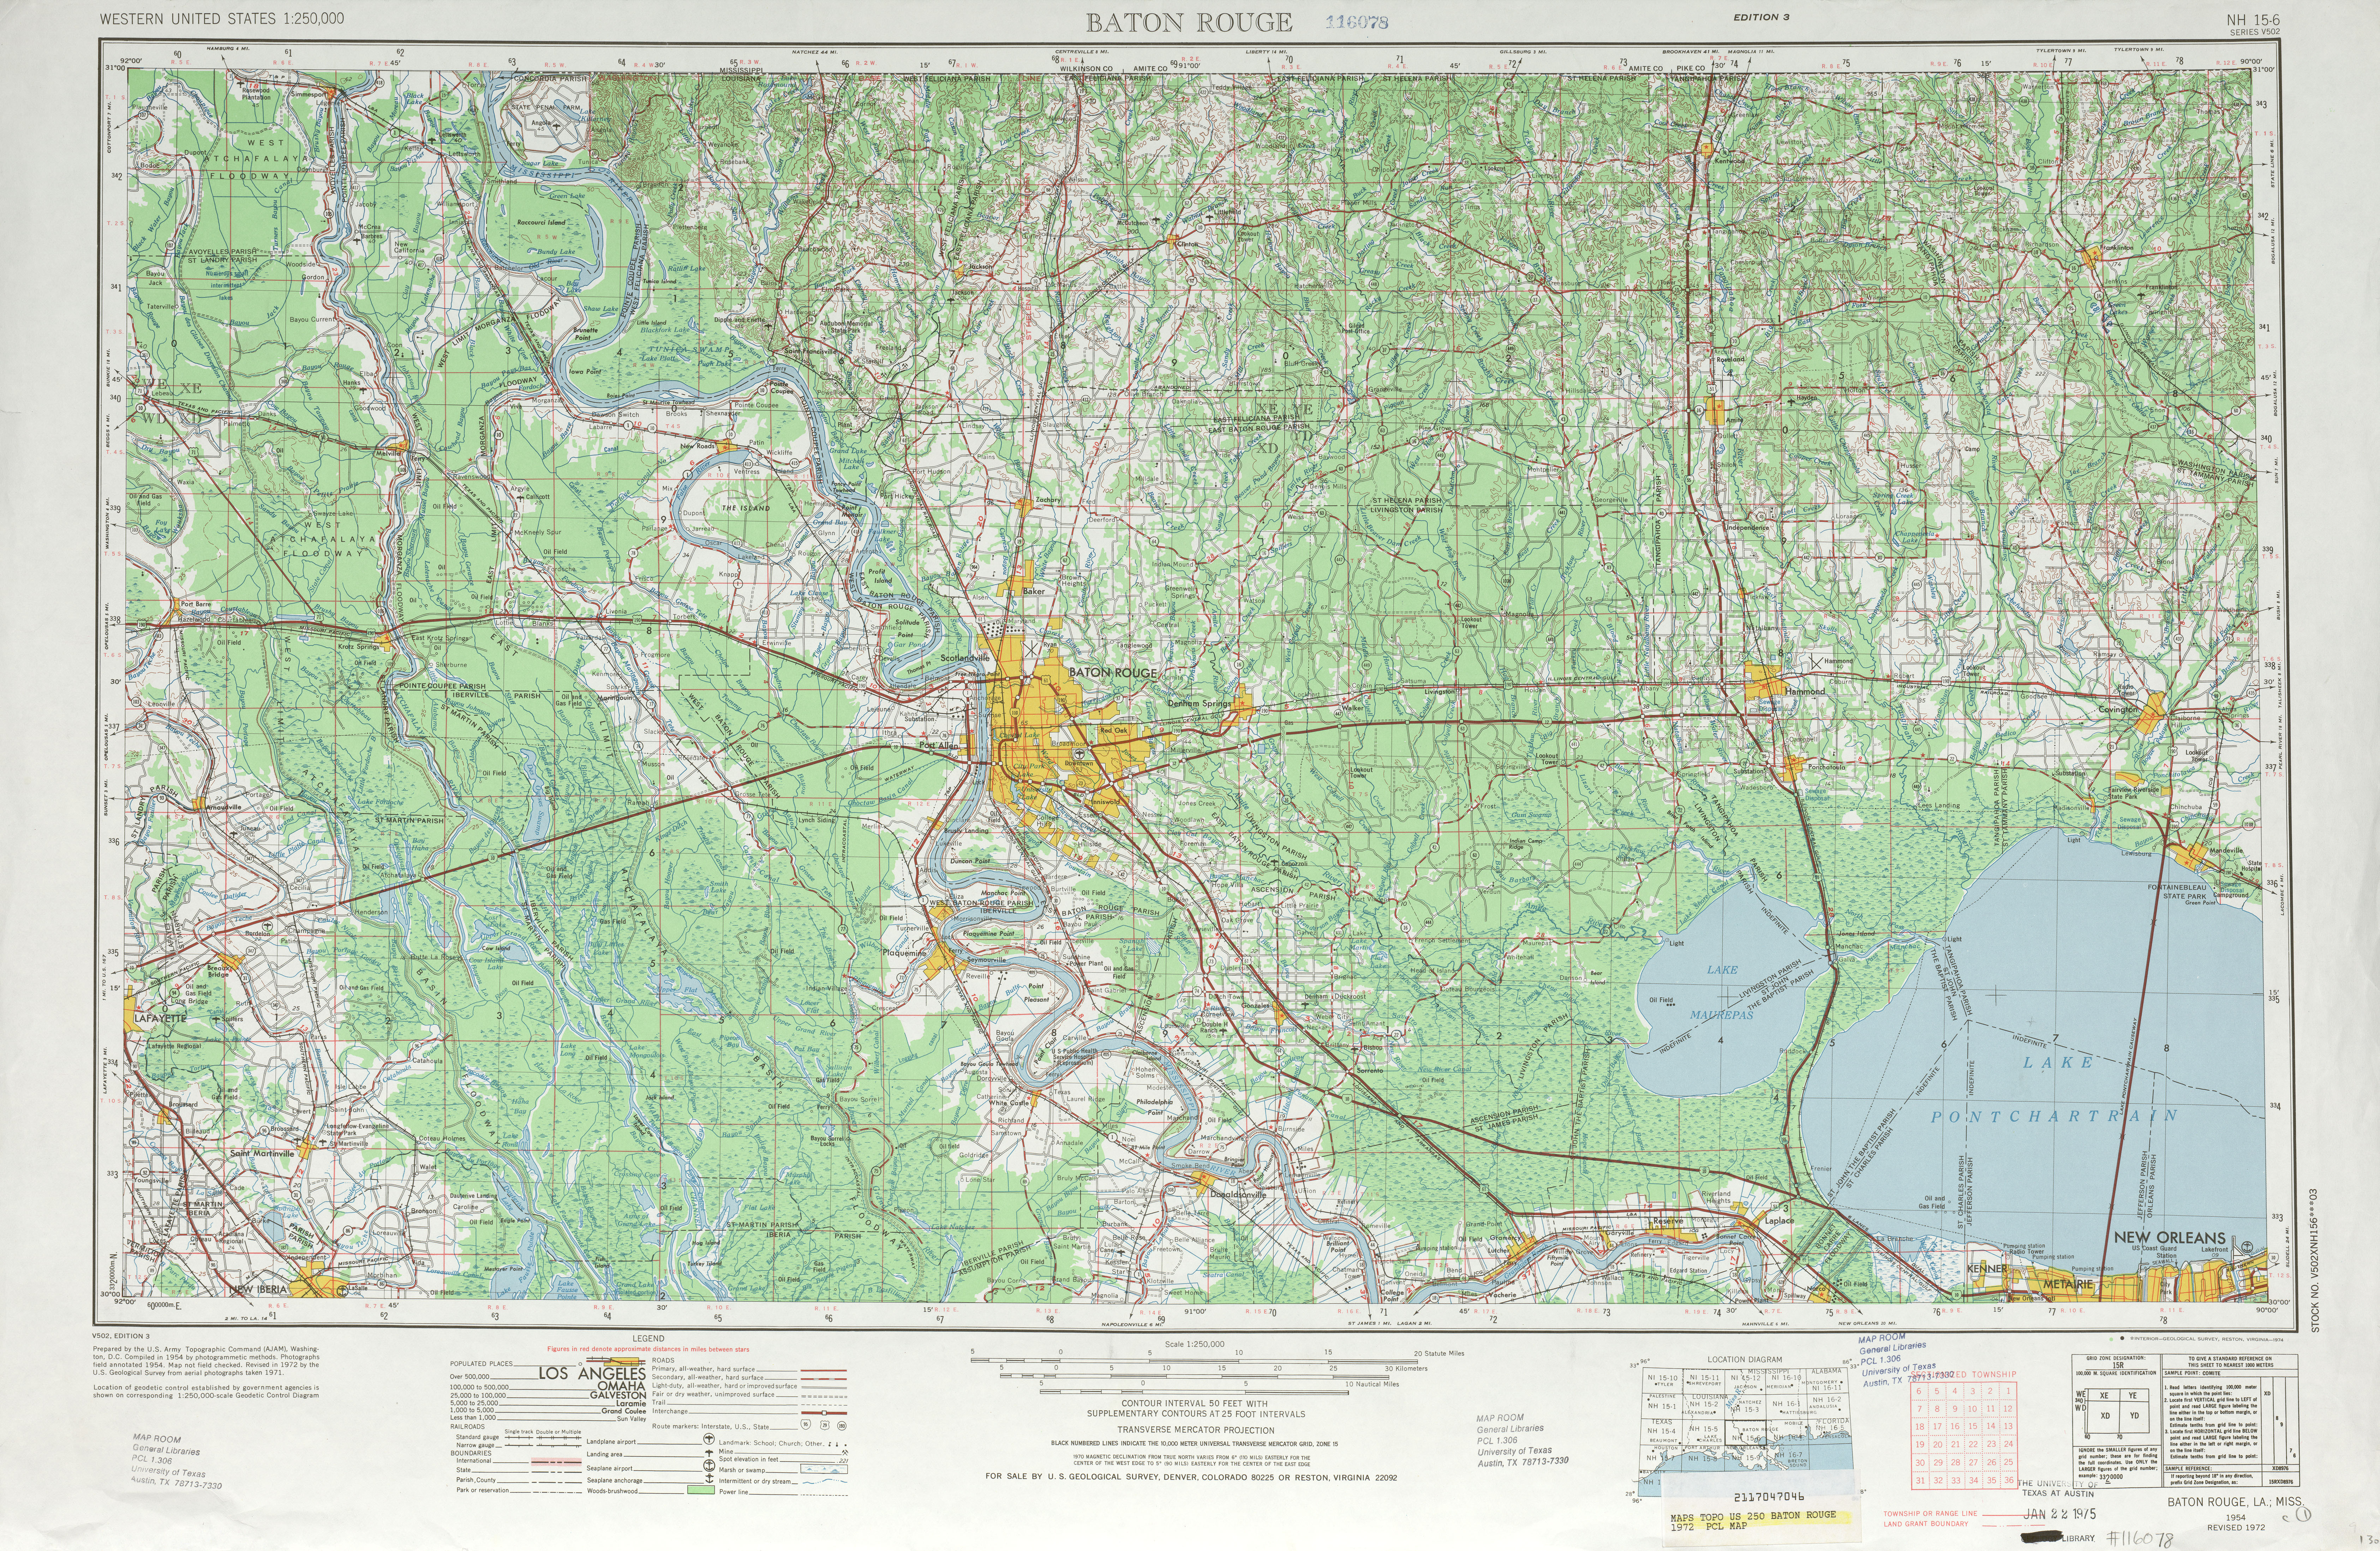 Baton Rouge Topographic Map Sheet, United States 1972